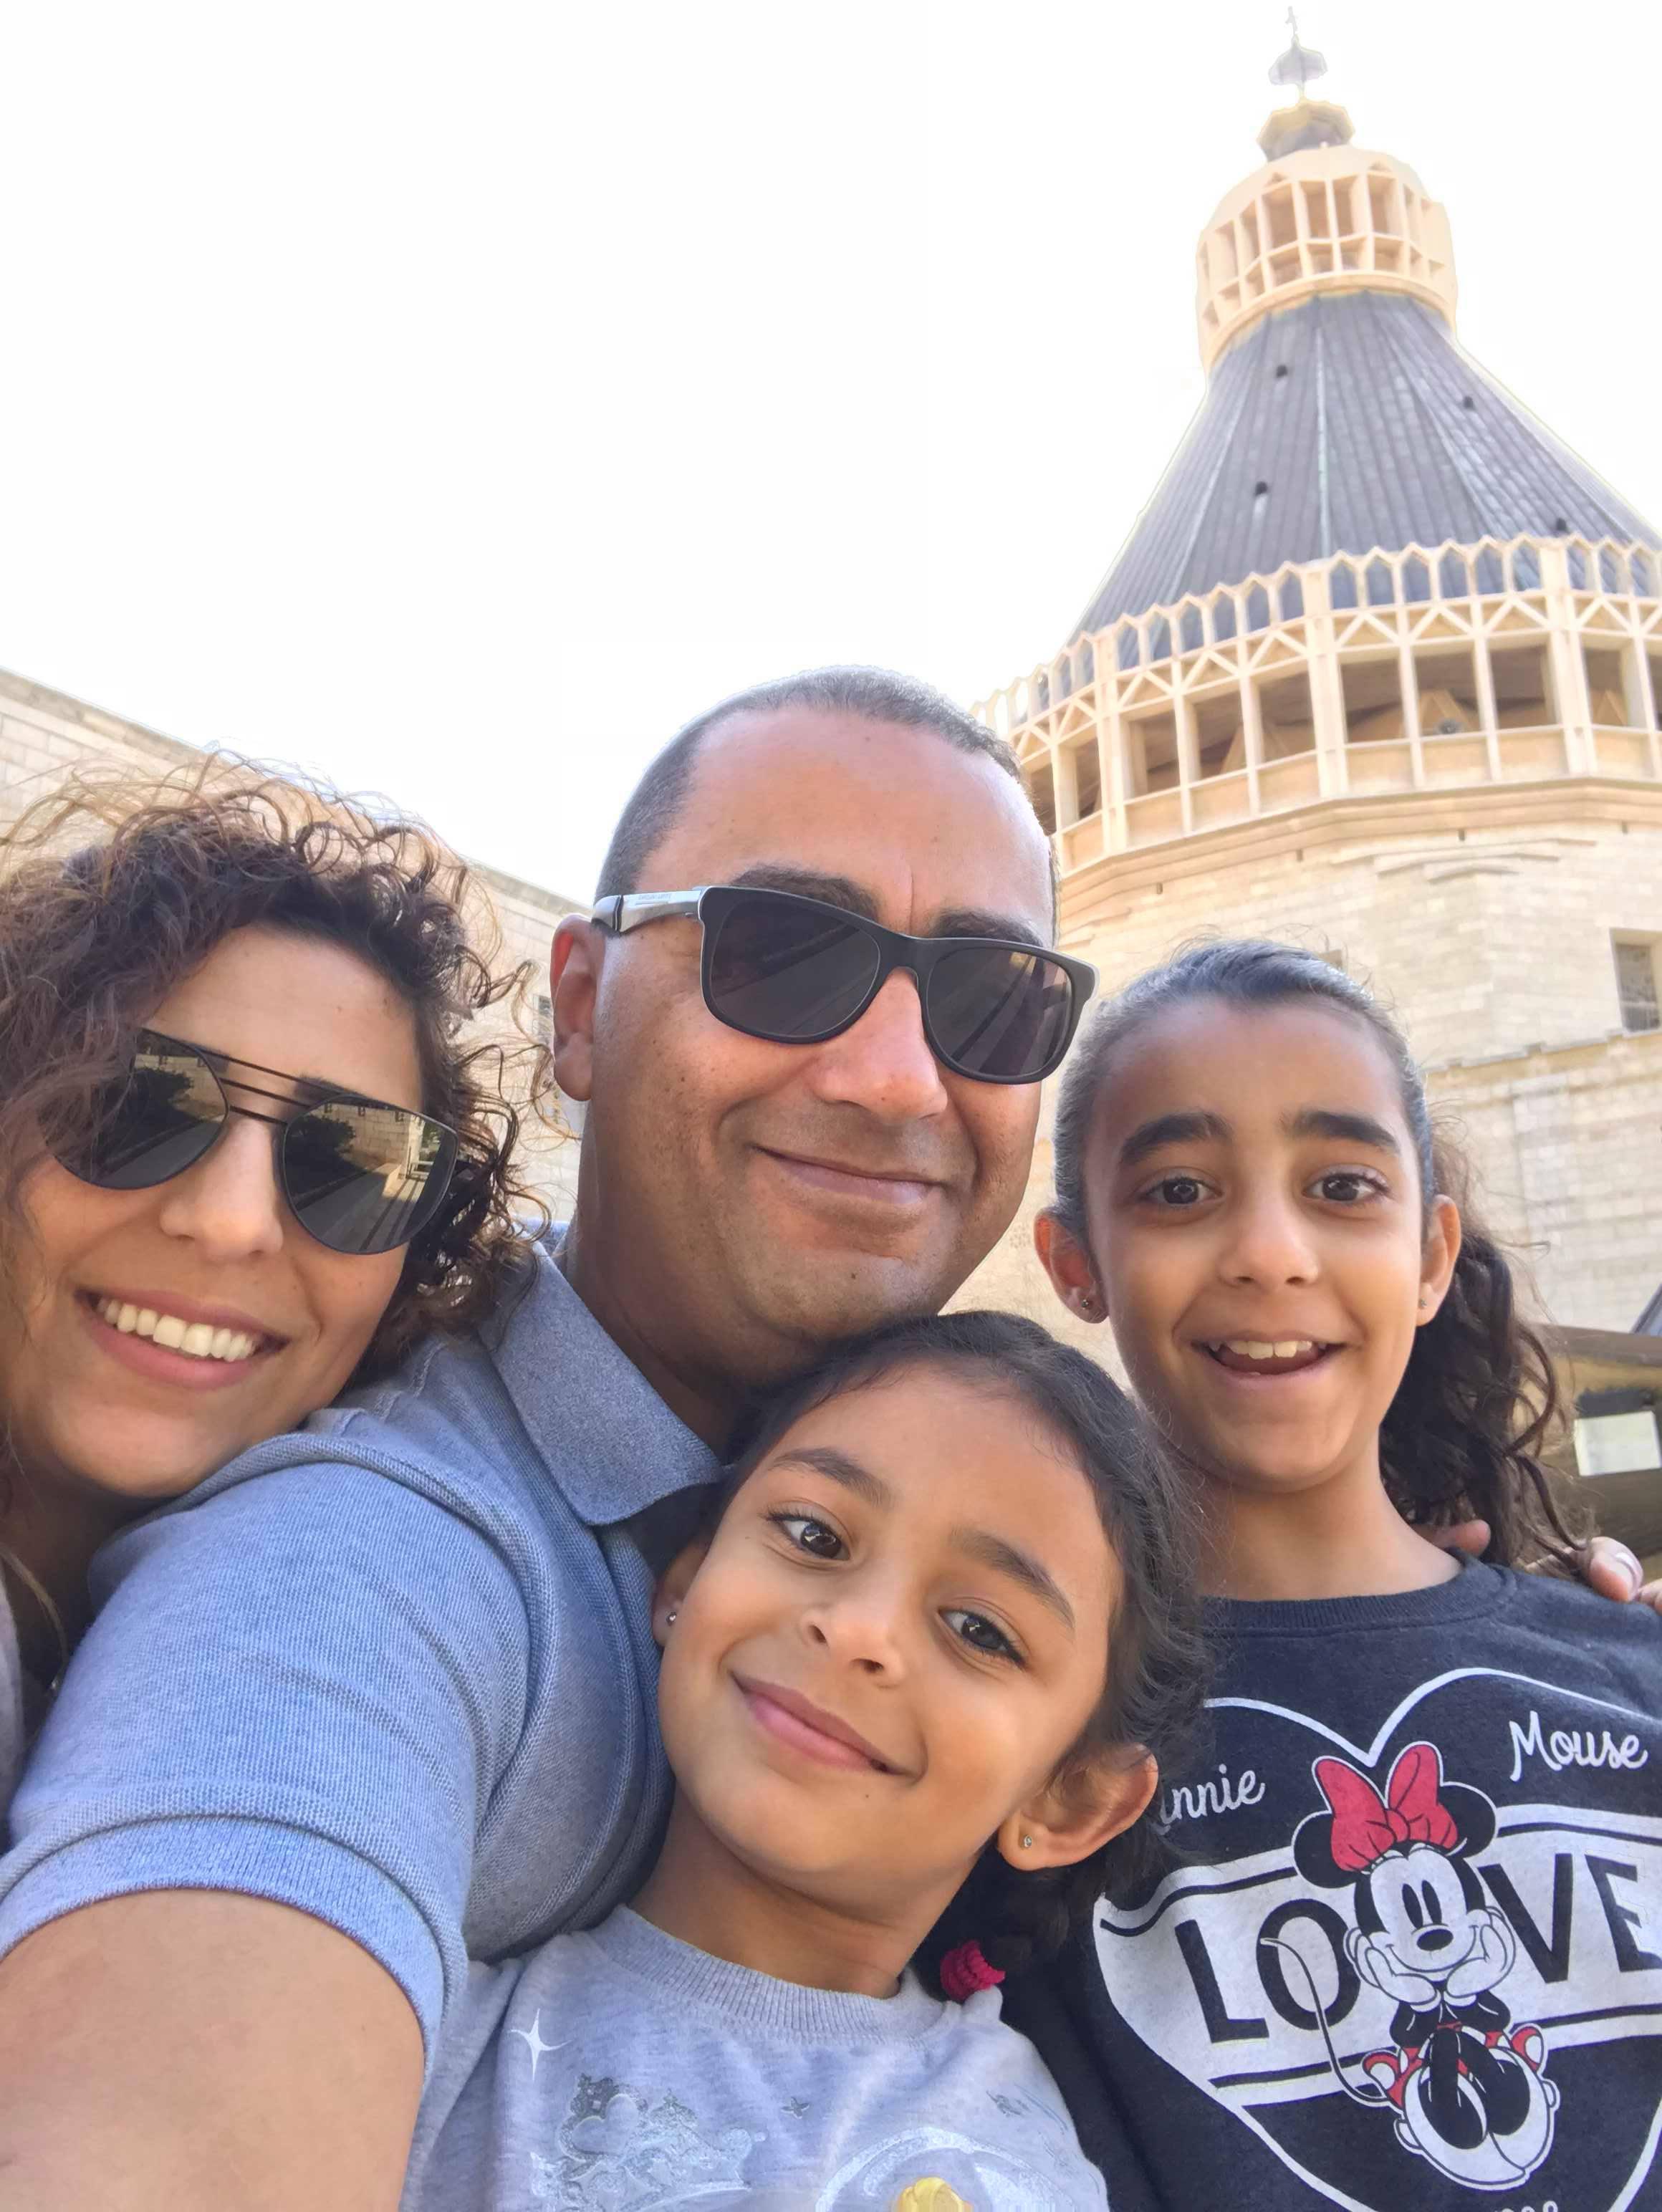 Rami Fellemon and his family